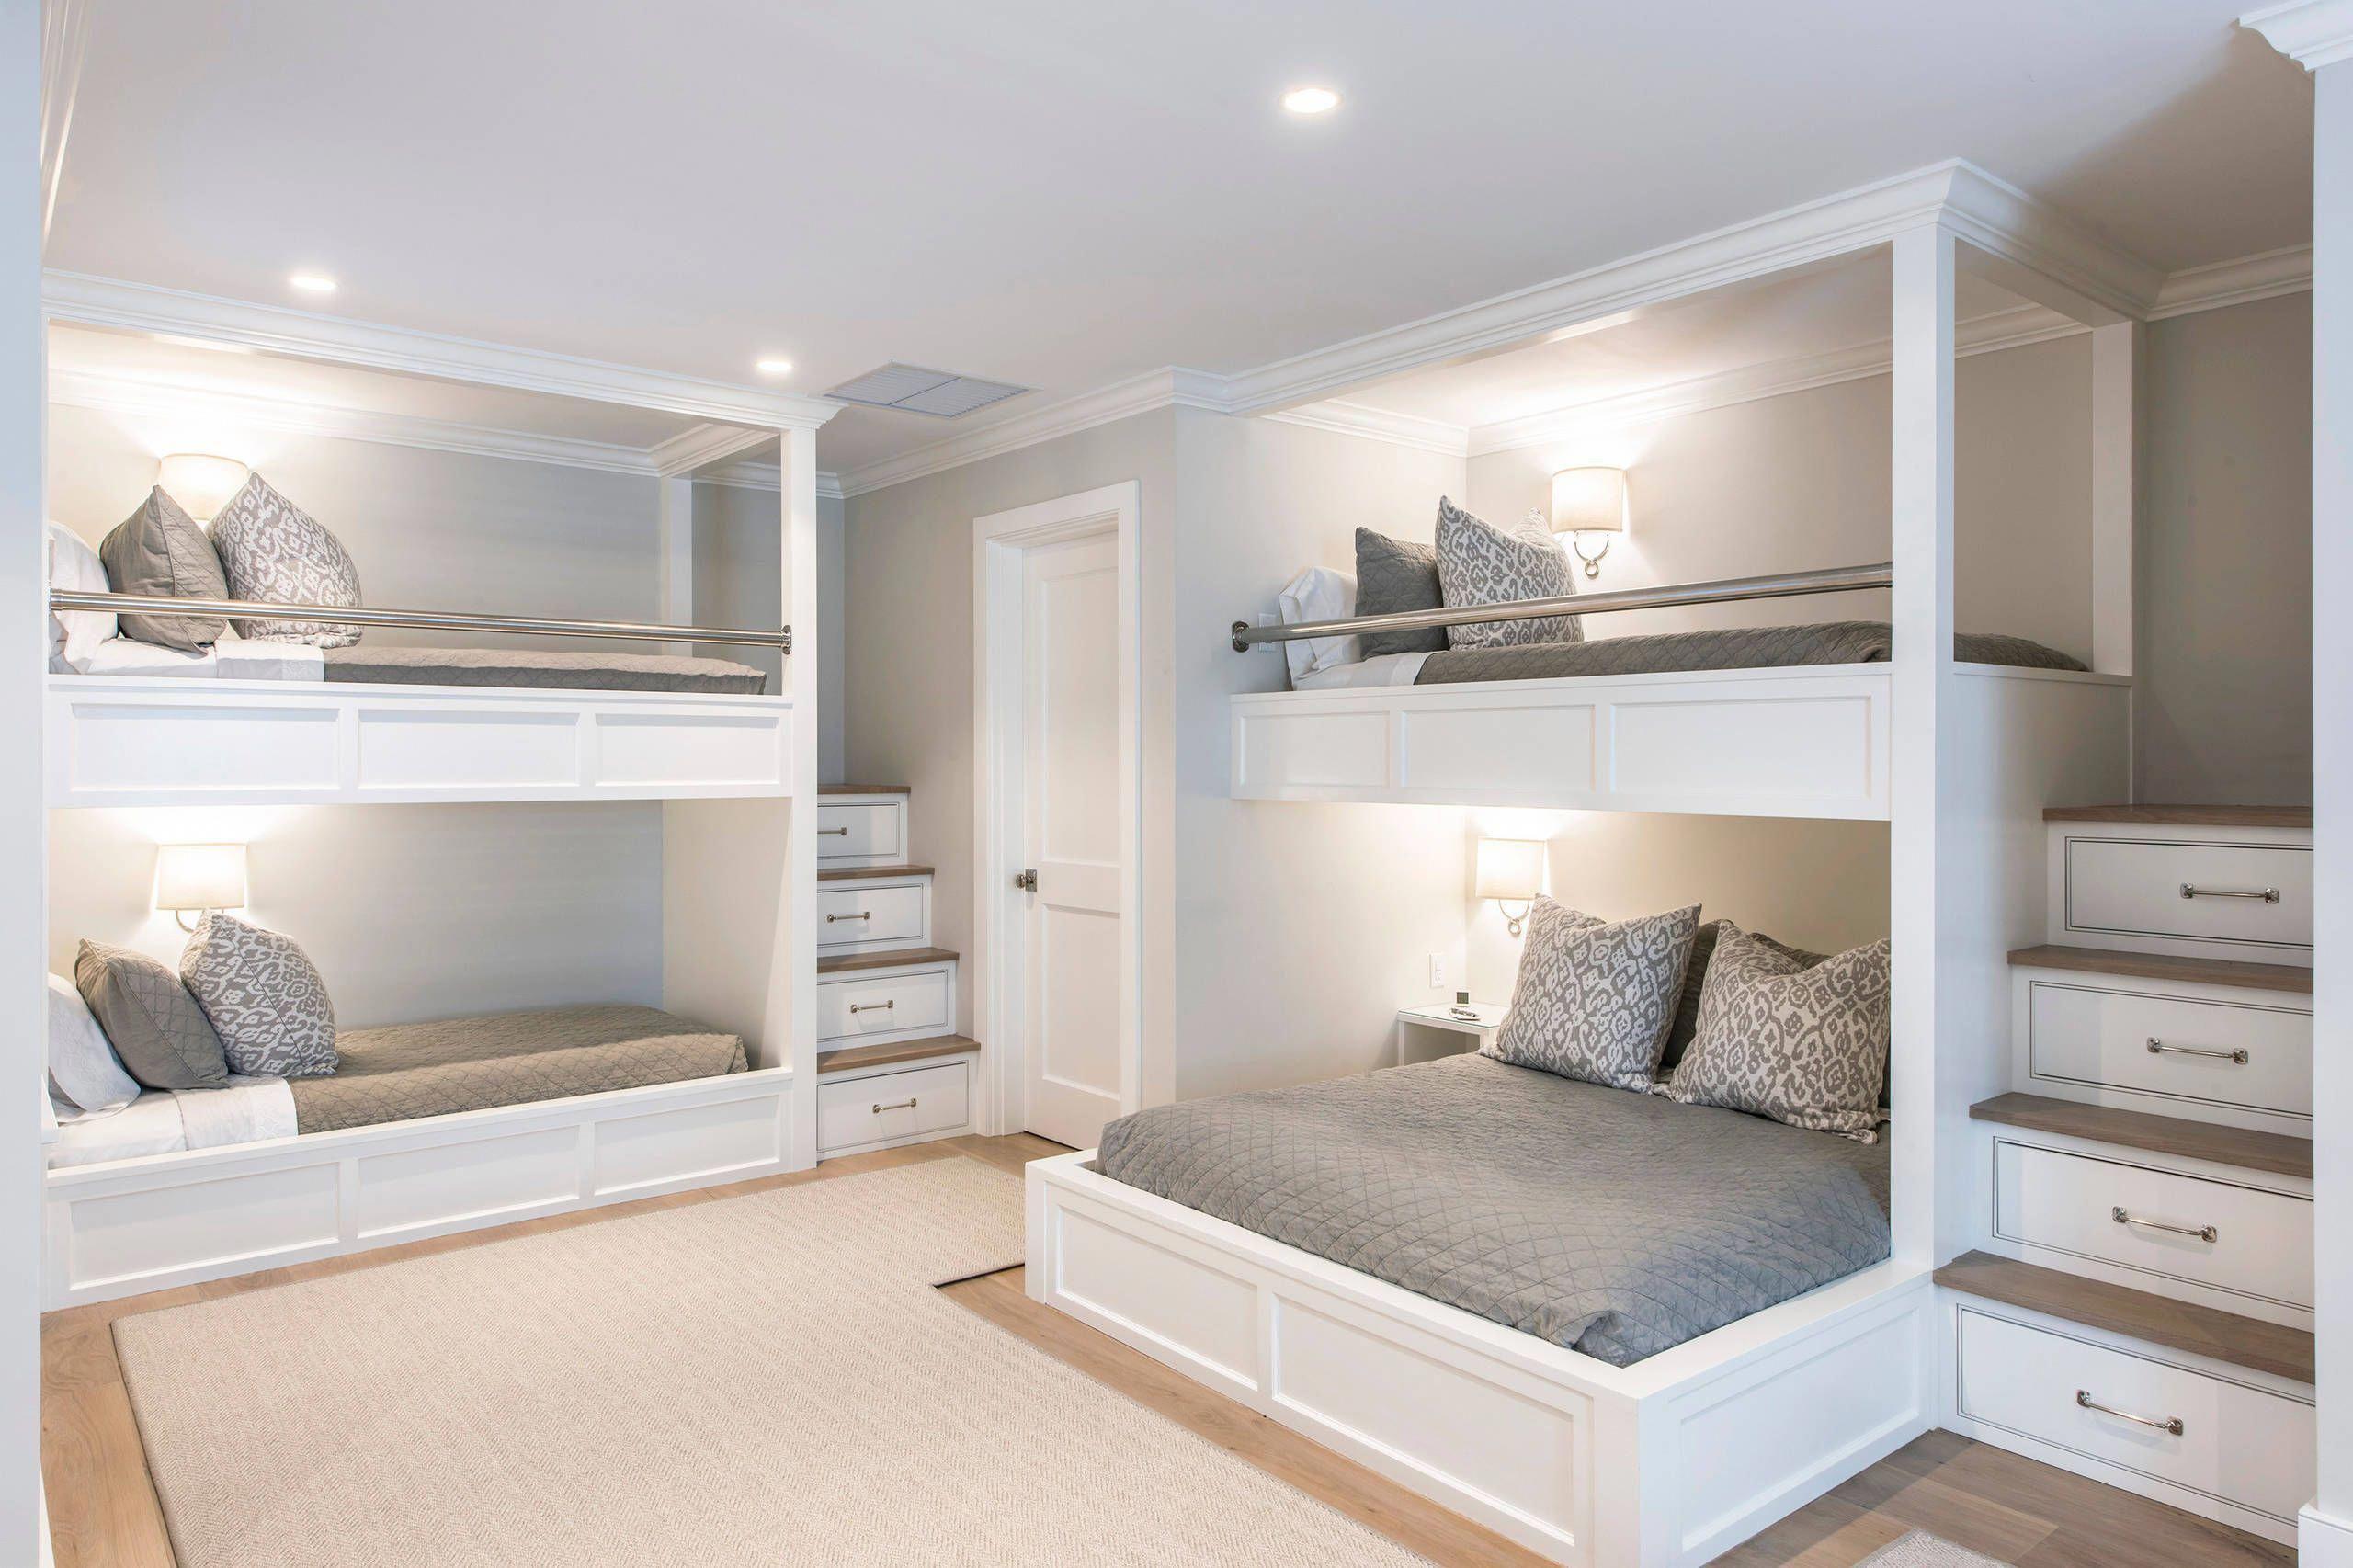 Photo of 40 Kid Rooms That Rock #roomdecorbedroom